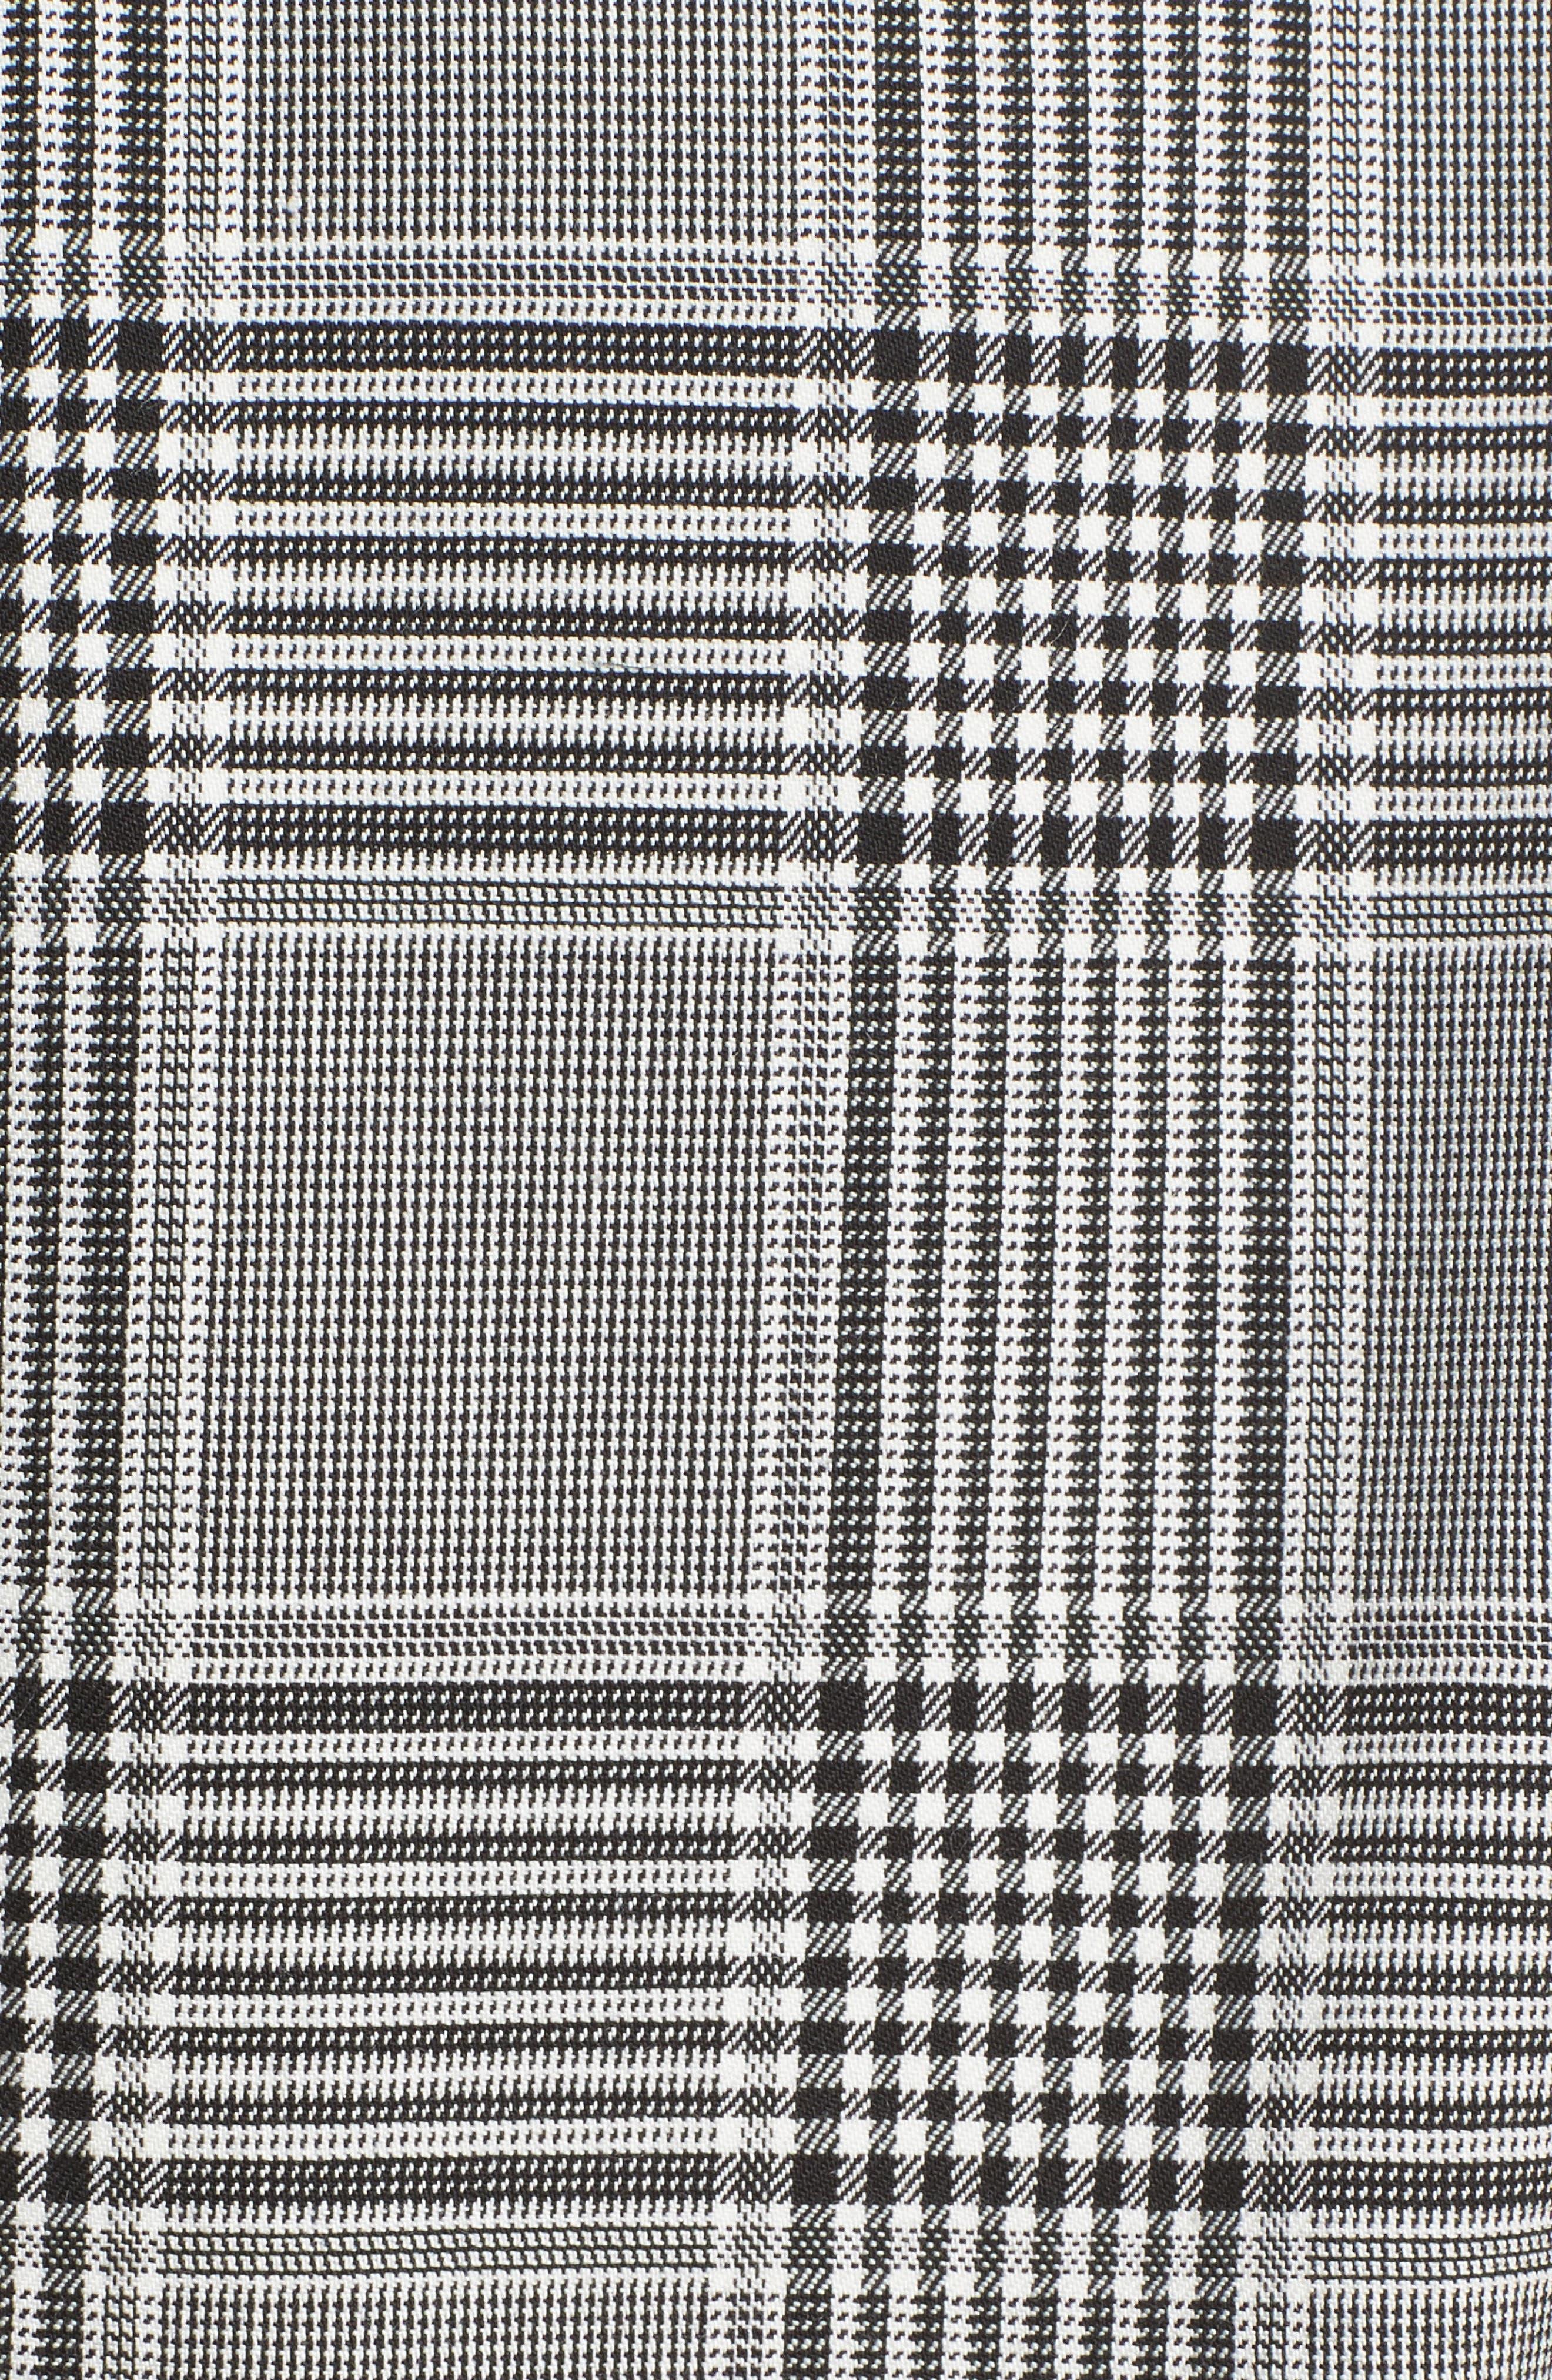 Leather Sleeve Check Blazer,                             Alternate thumbnail 6, color,                             Black/ White